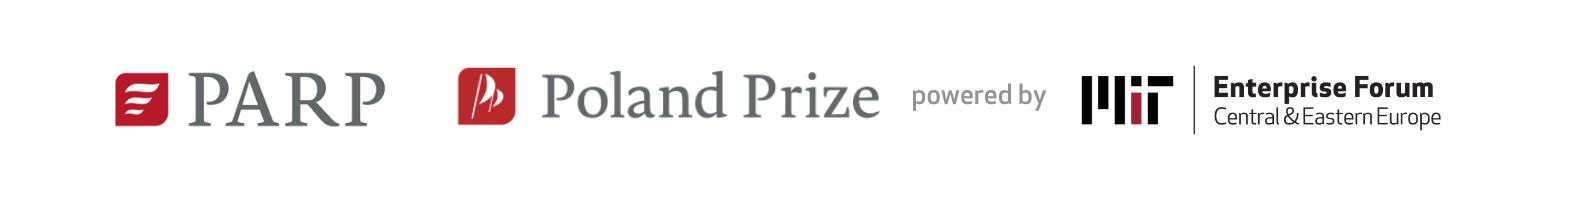 poland prize by mit ef cee